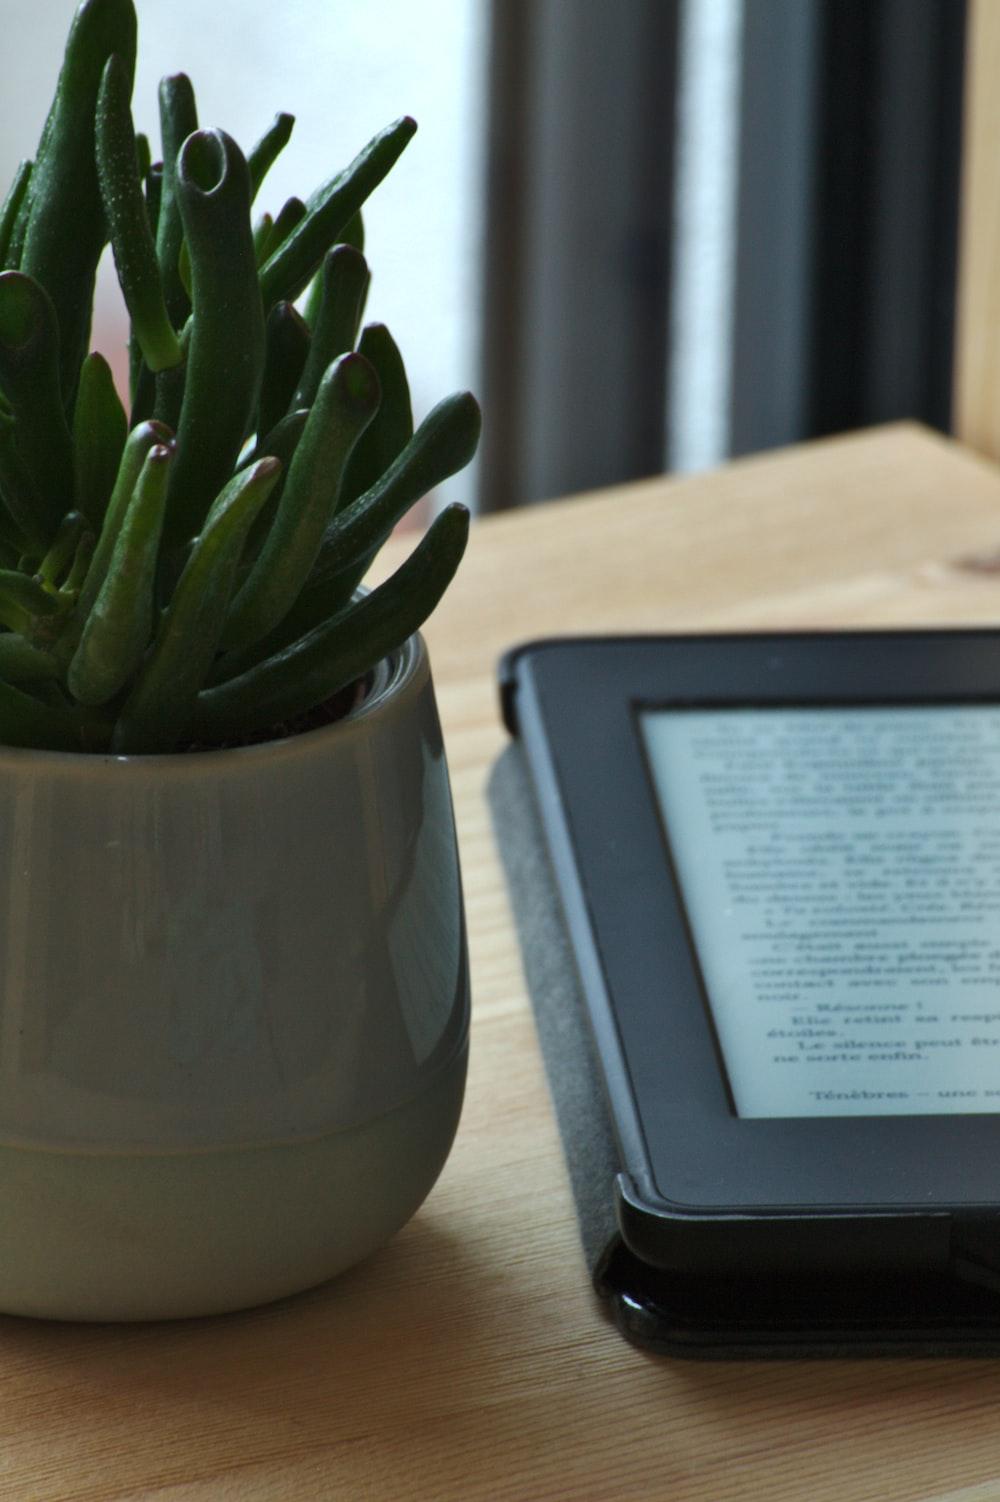 black e book reader beside green cactus plant